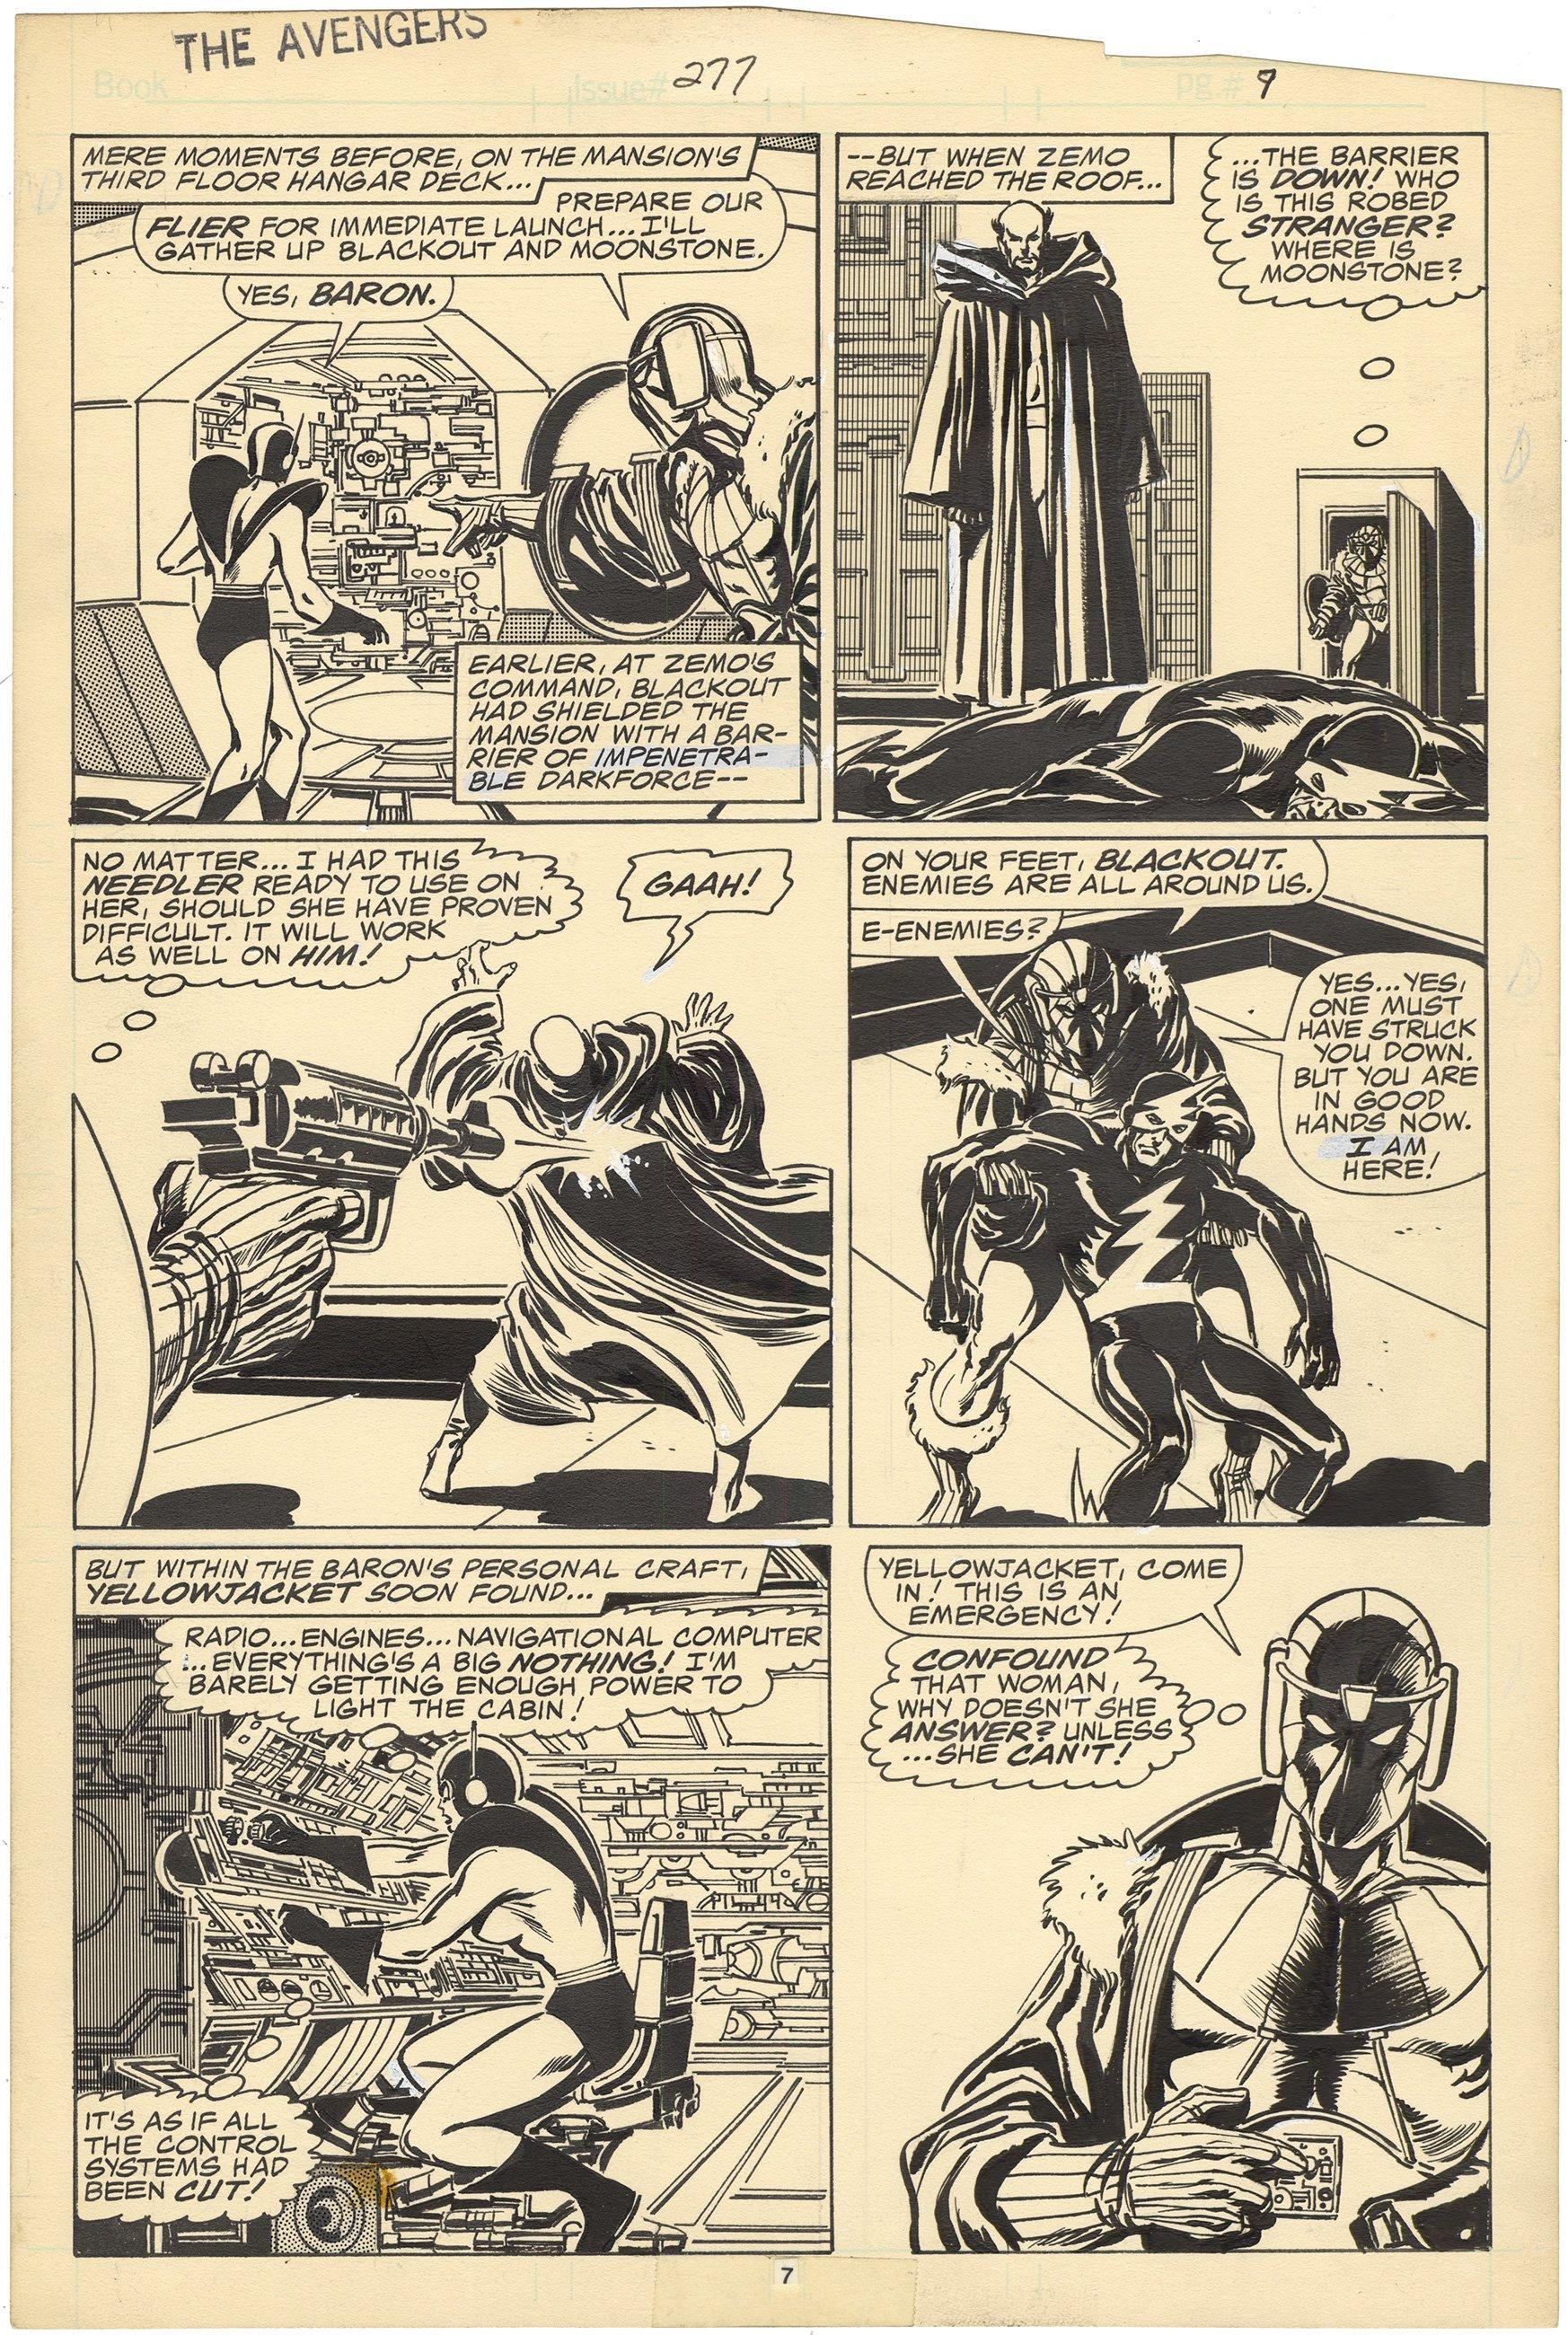 Avengers #277 p7